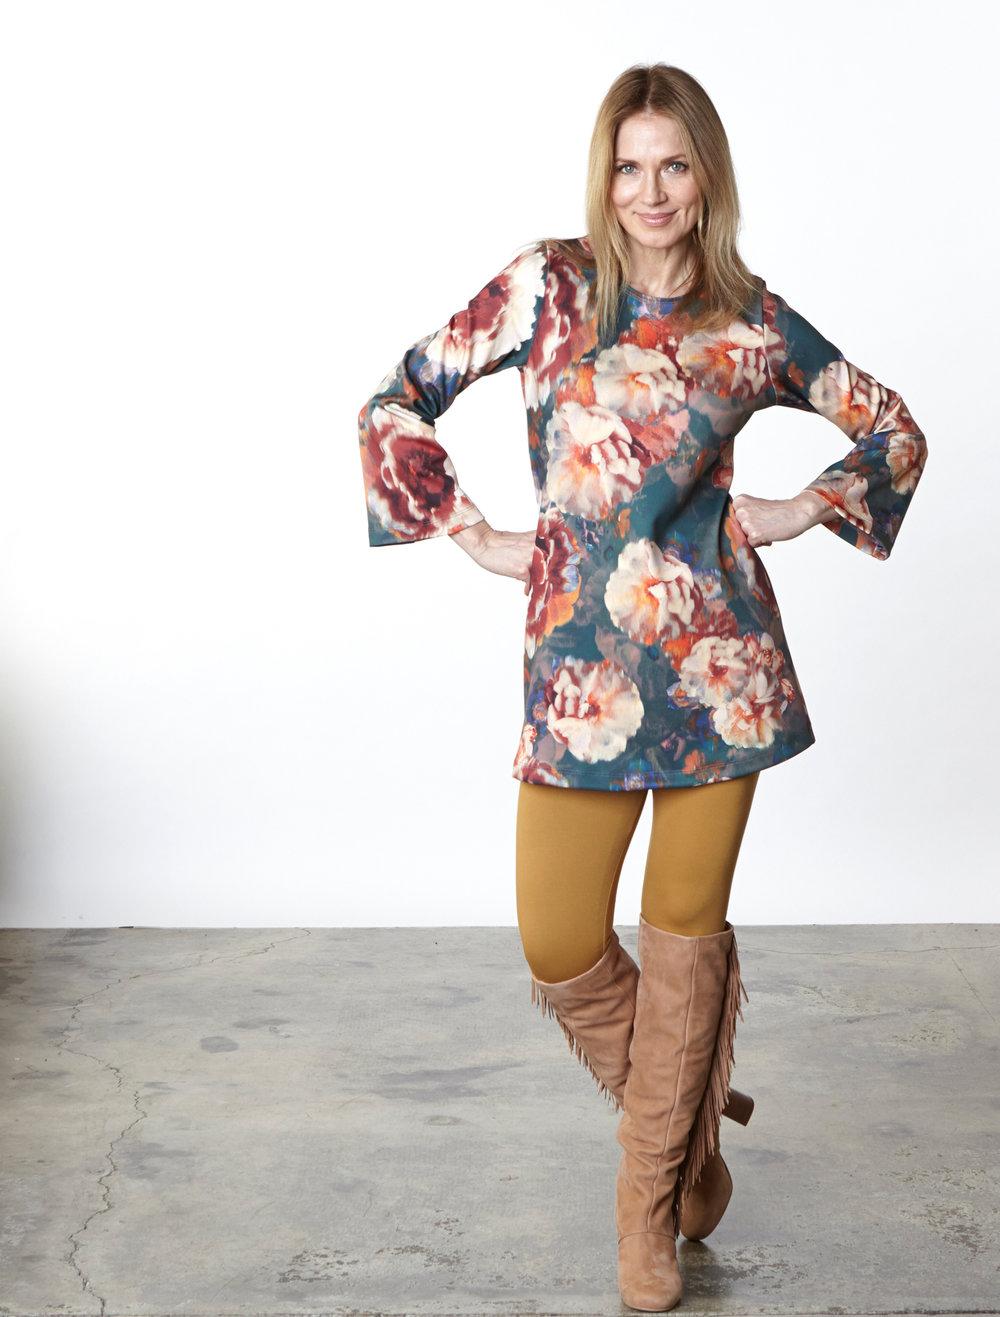 Yasmin Dress in Fiori Italian Print Scuba,Legging in Camel Modal Ponti